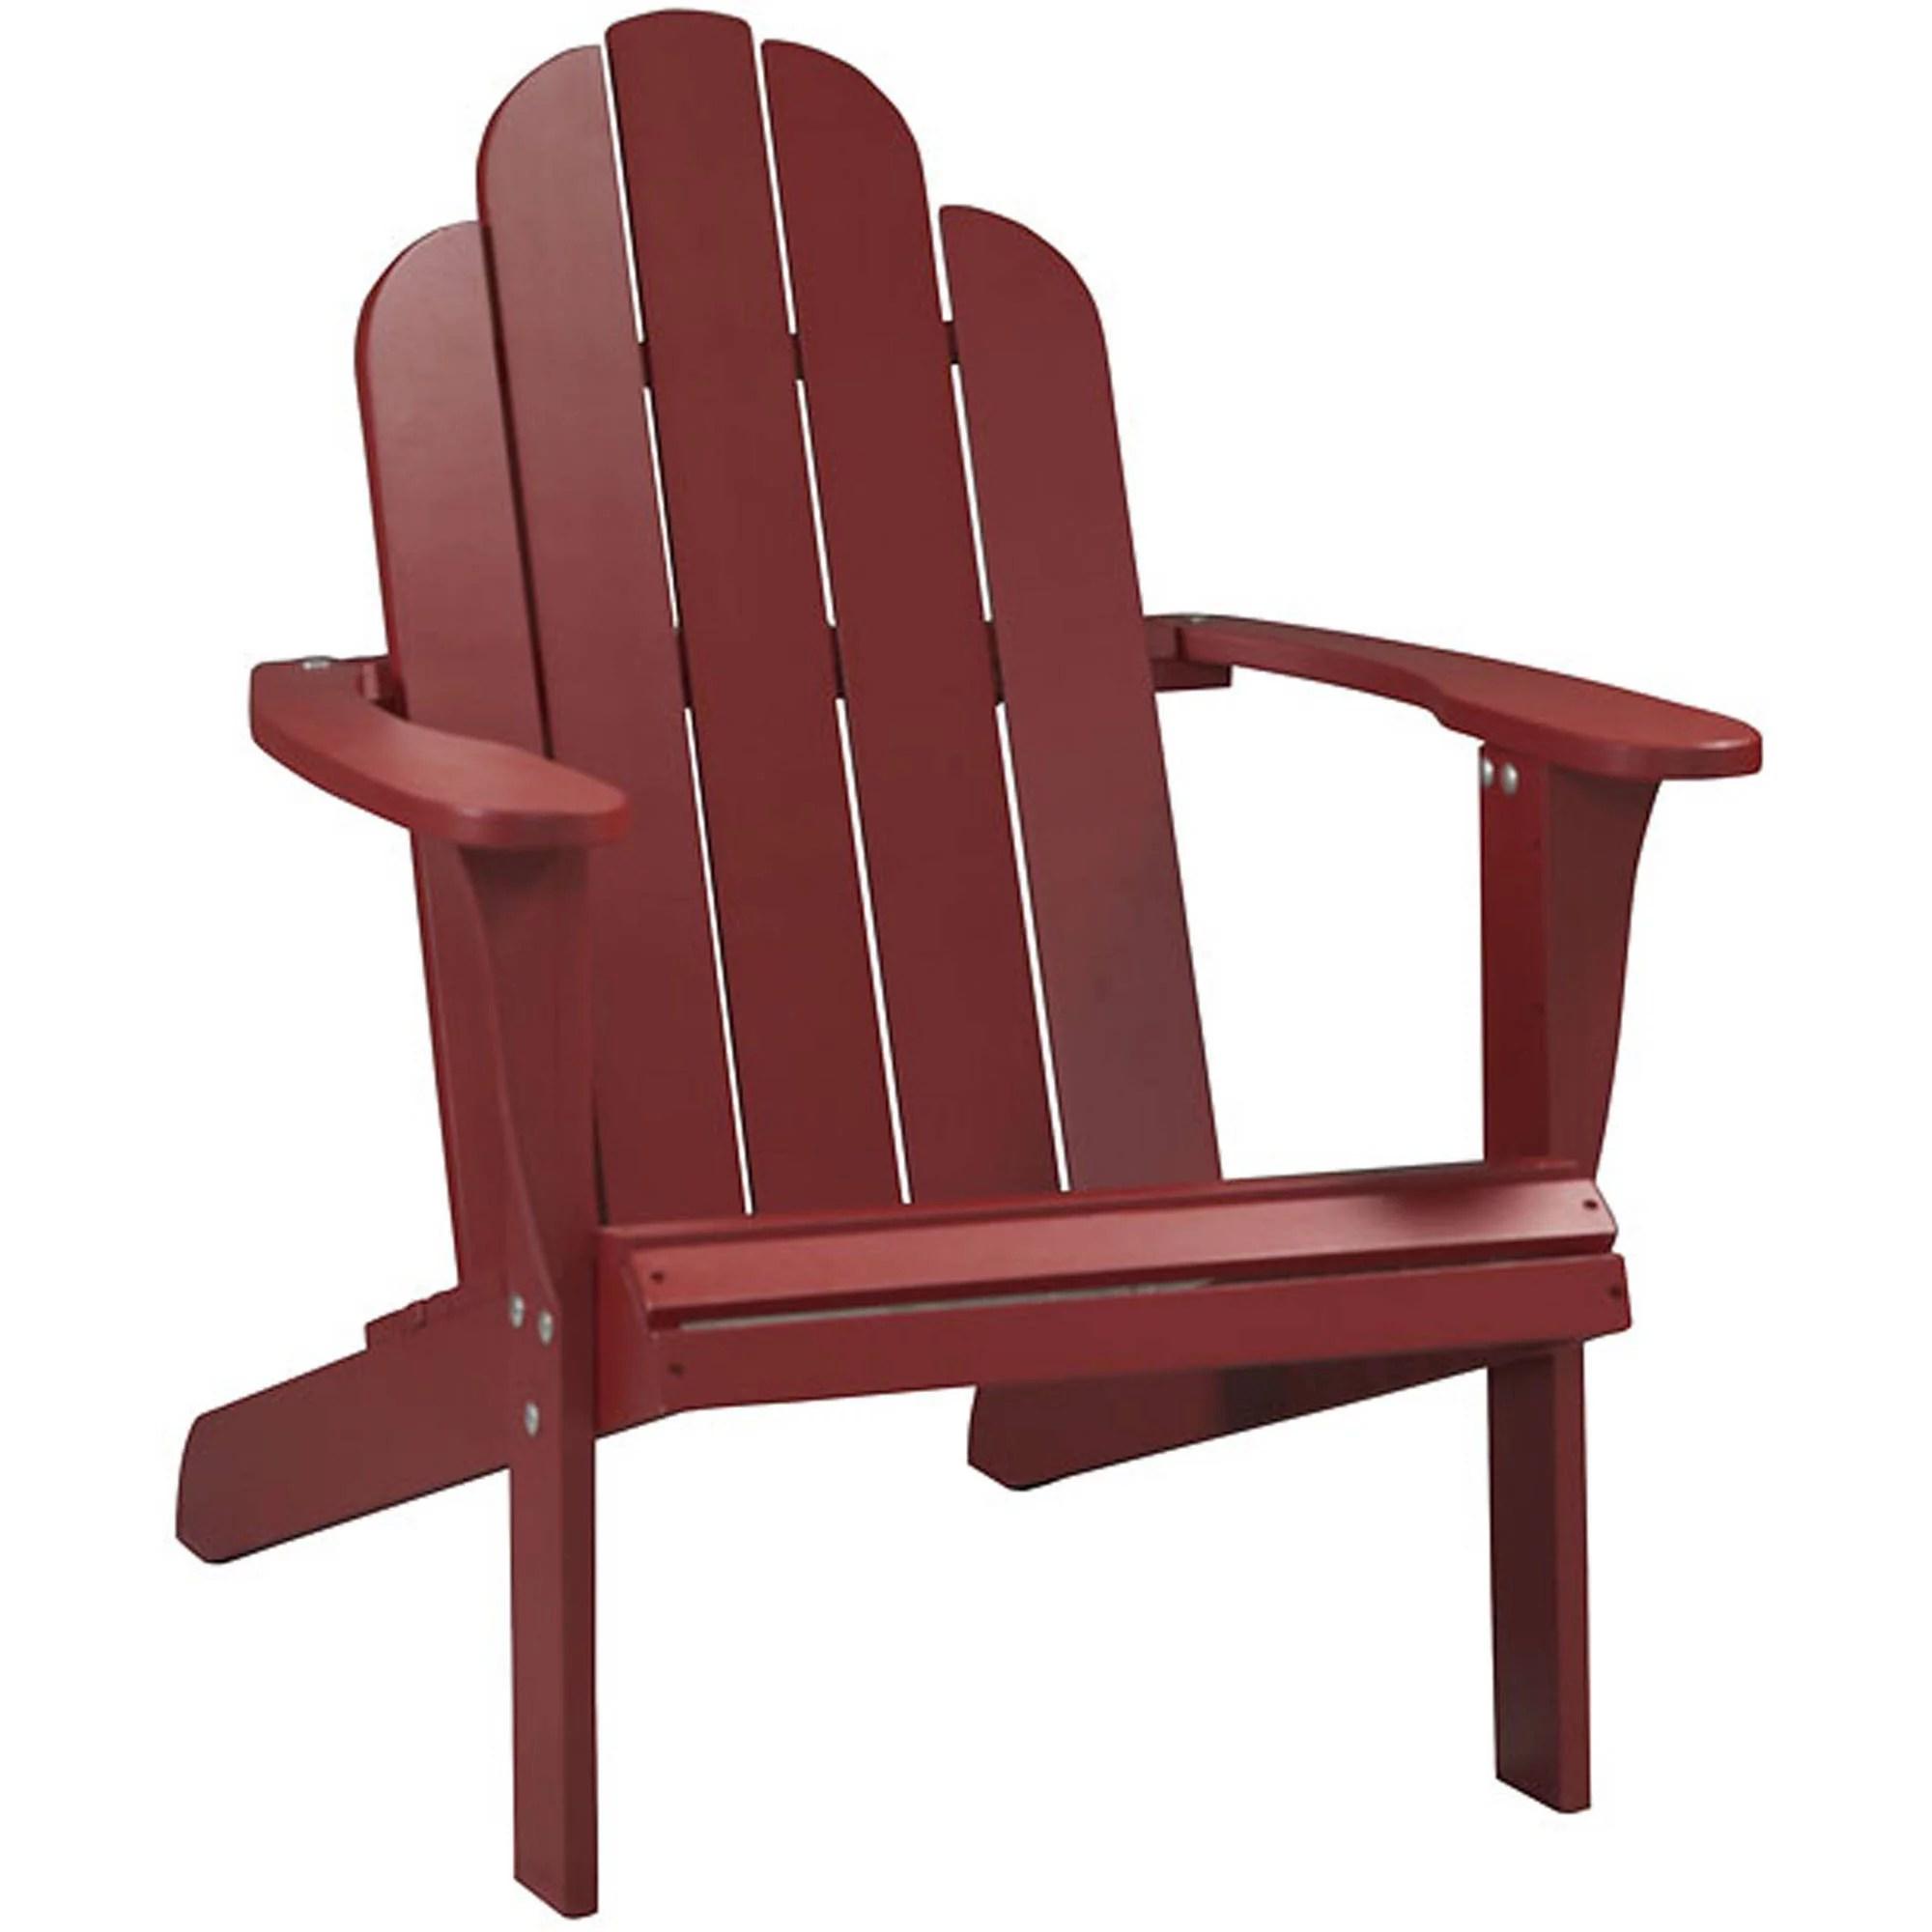 KidKraft Adirondack Chair  Espresso  85  Walmartcom